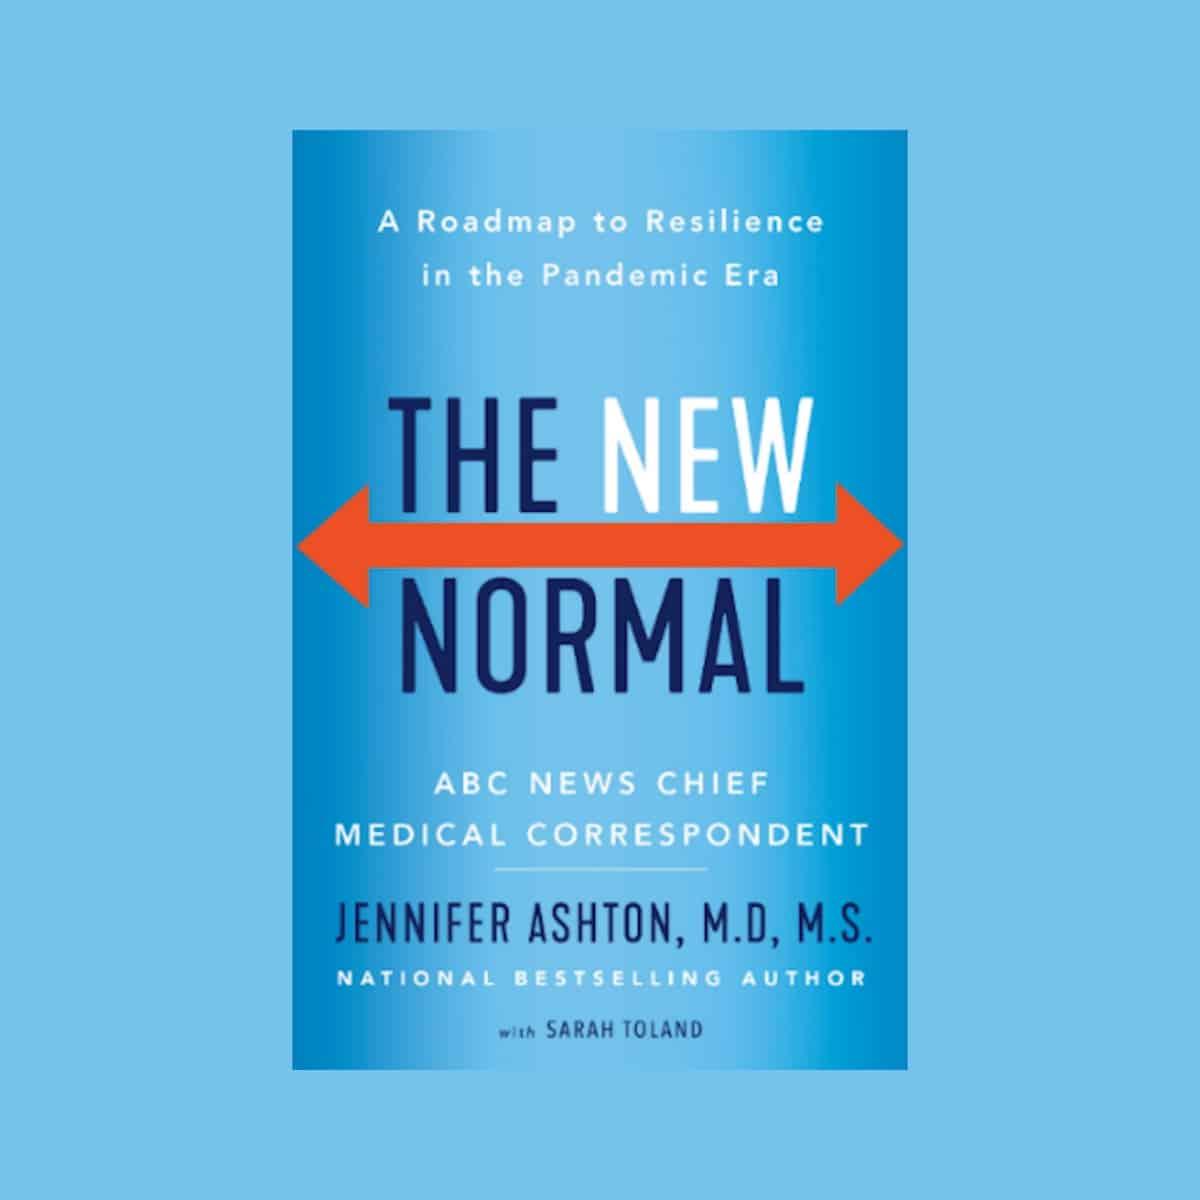 The New Normal by Dr., Jennifer Ashton